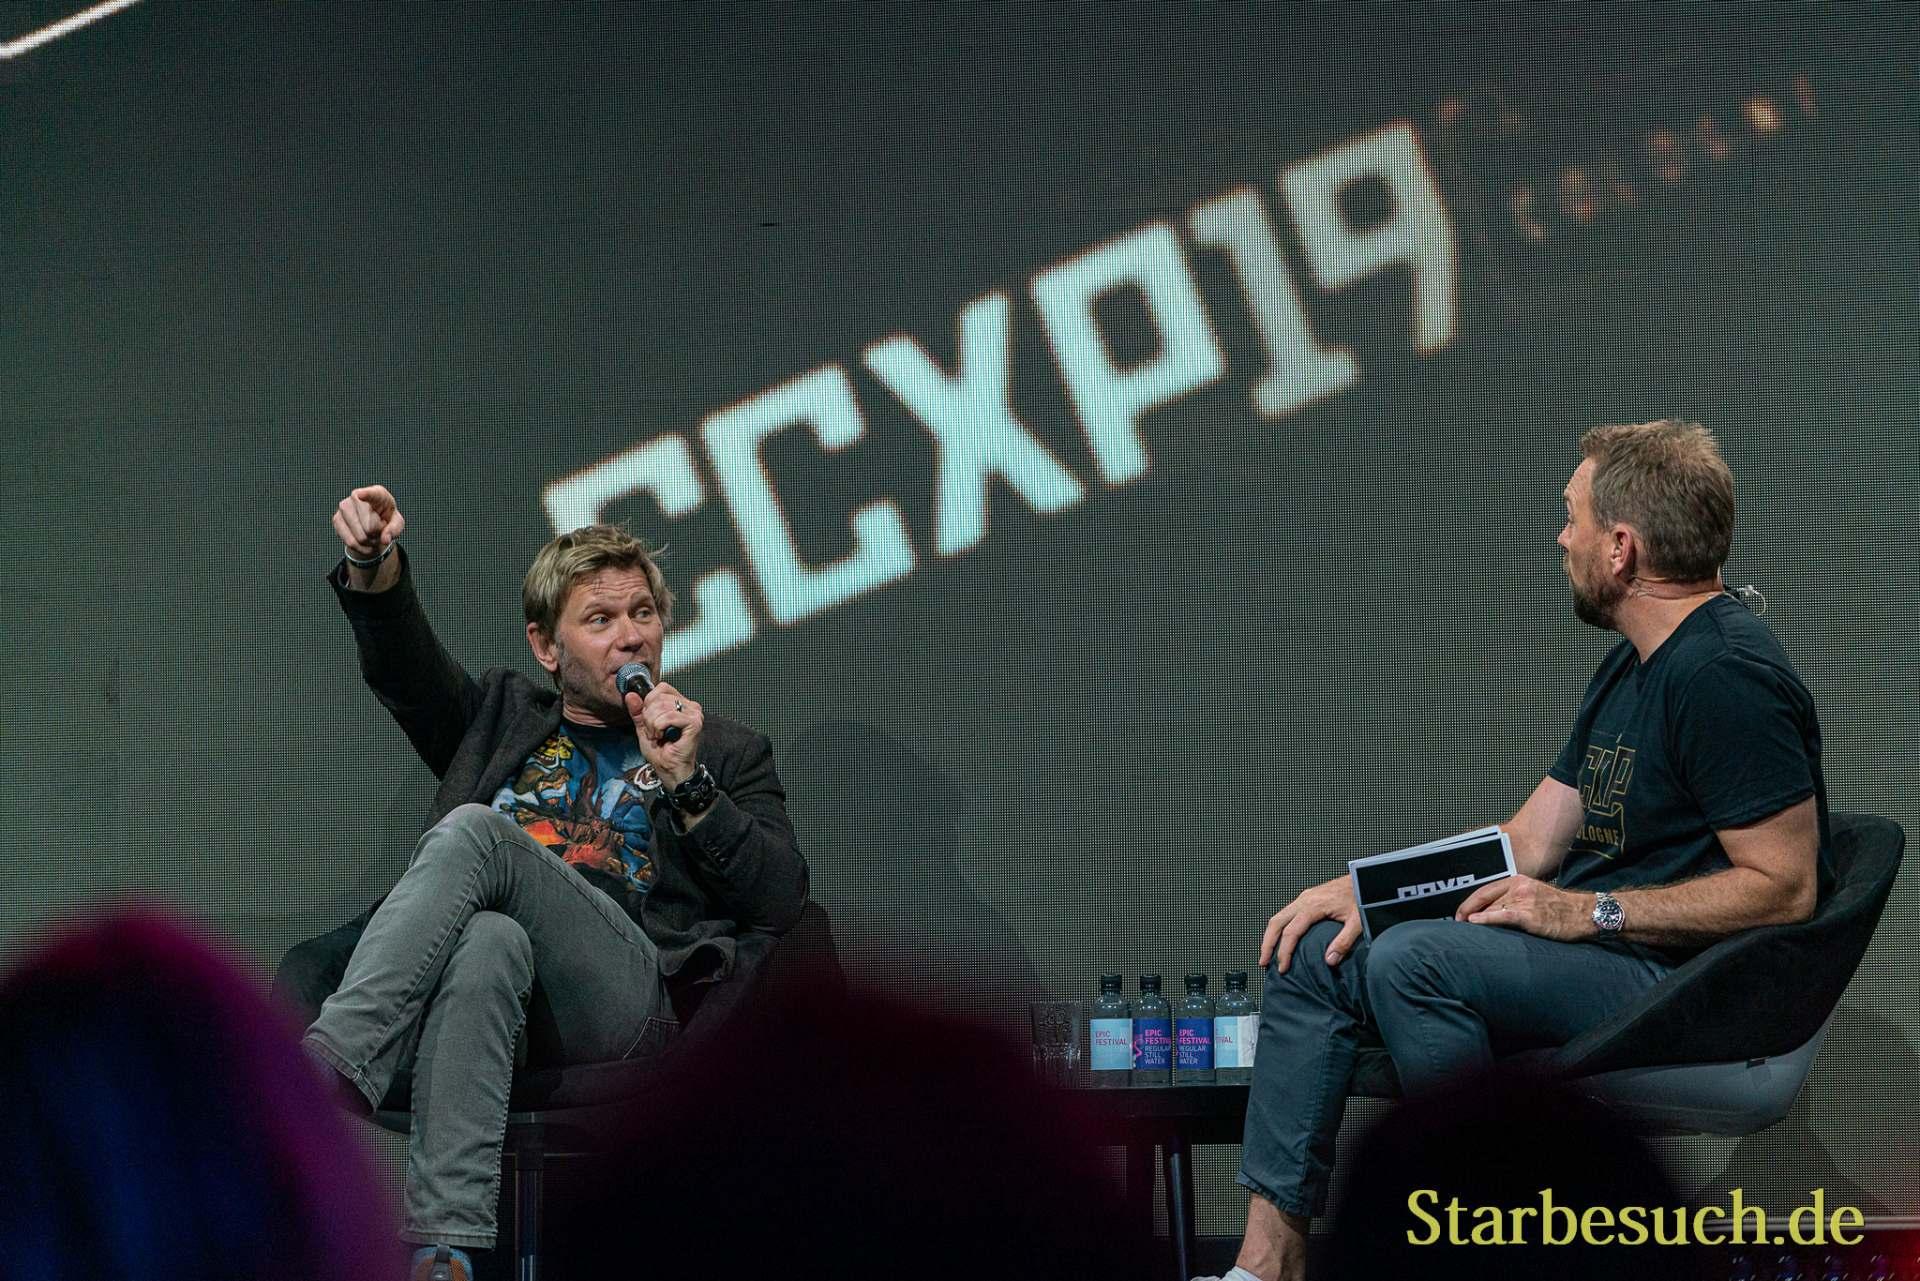 COLOGNE, GERMANY - JUN 28th 2019: Mark Pellegrino and Steven Gätjen at CCXP Cologne